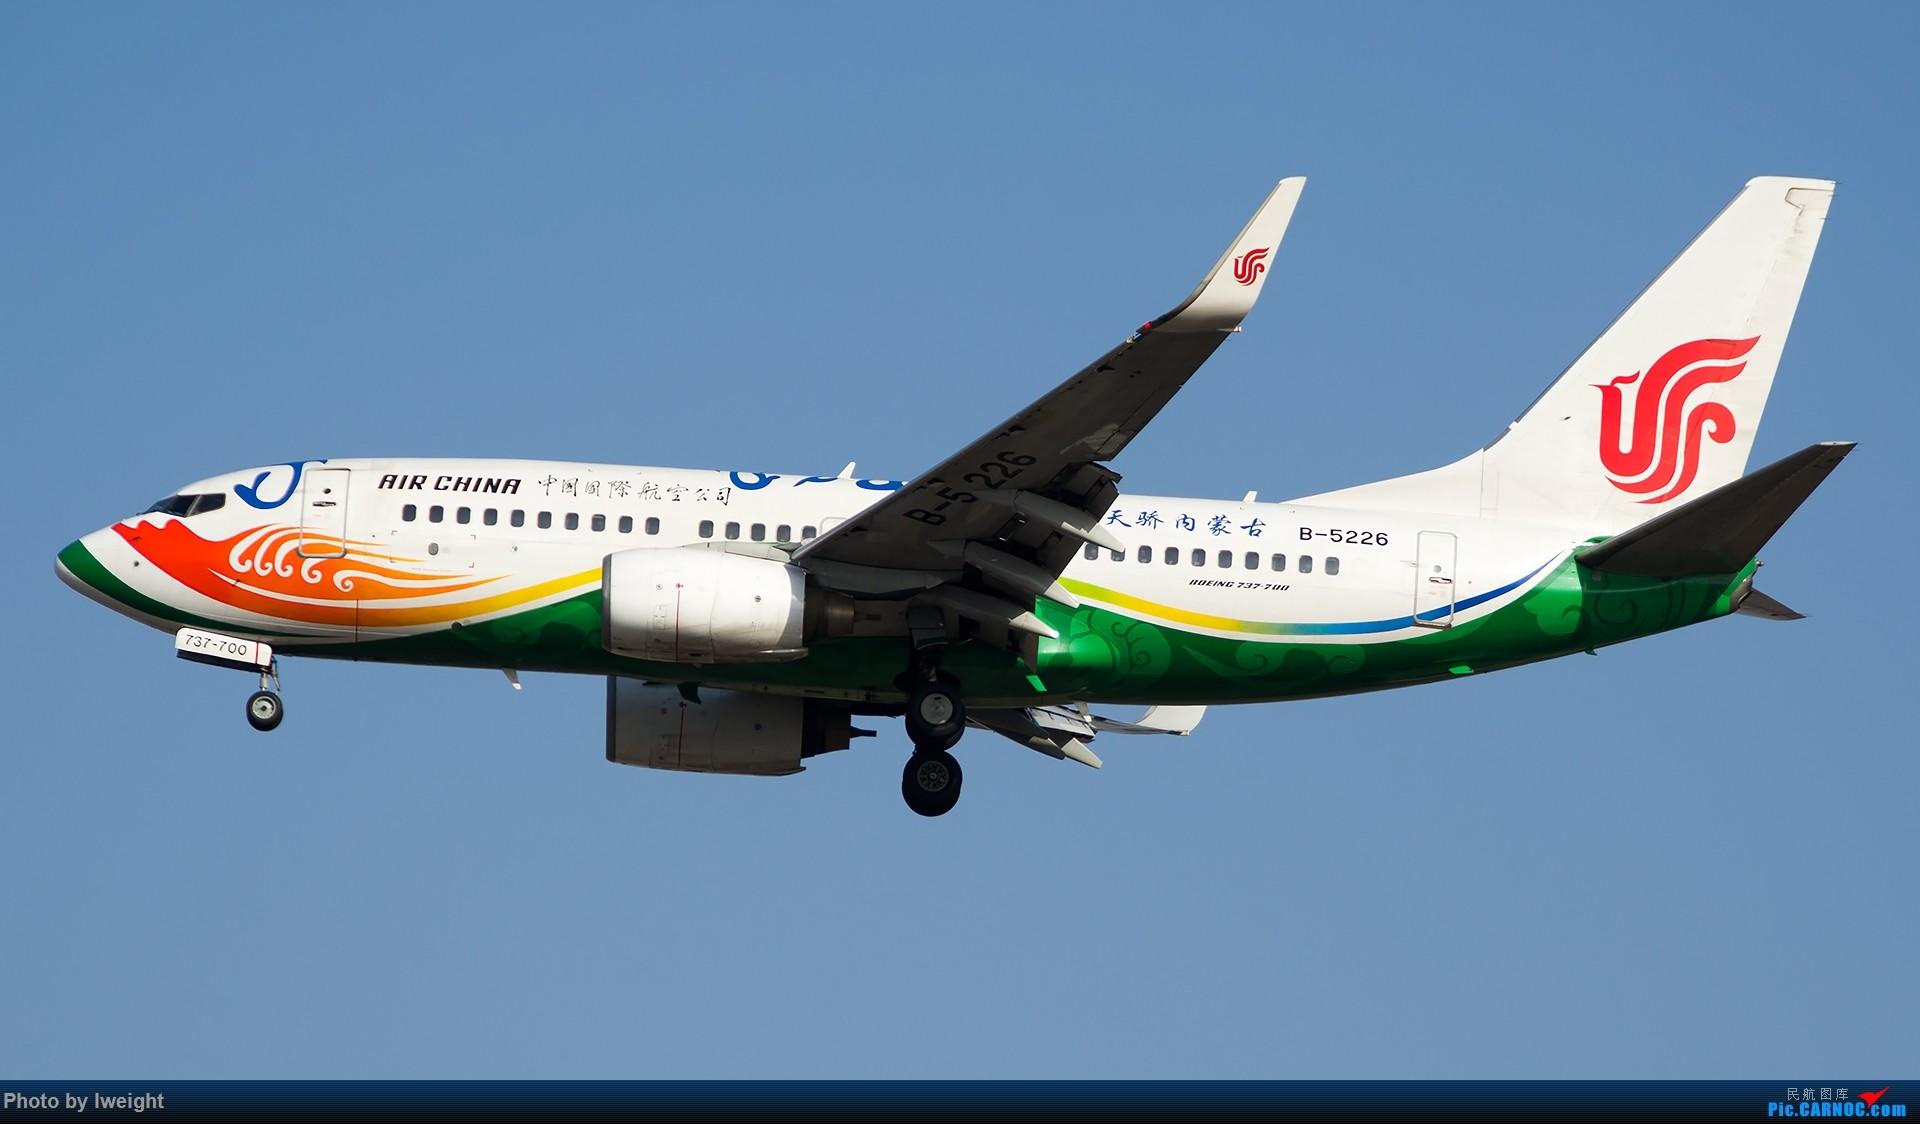 Re:[原创]羊年第一次拍机,首都机场[2015-2-23] BOEING 737-700 B-5226 中国北京首都国际机场